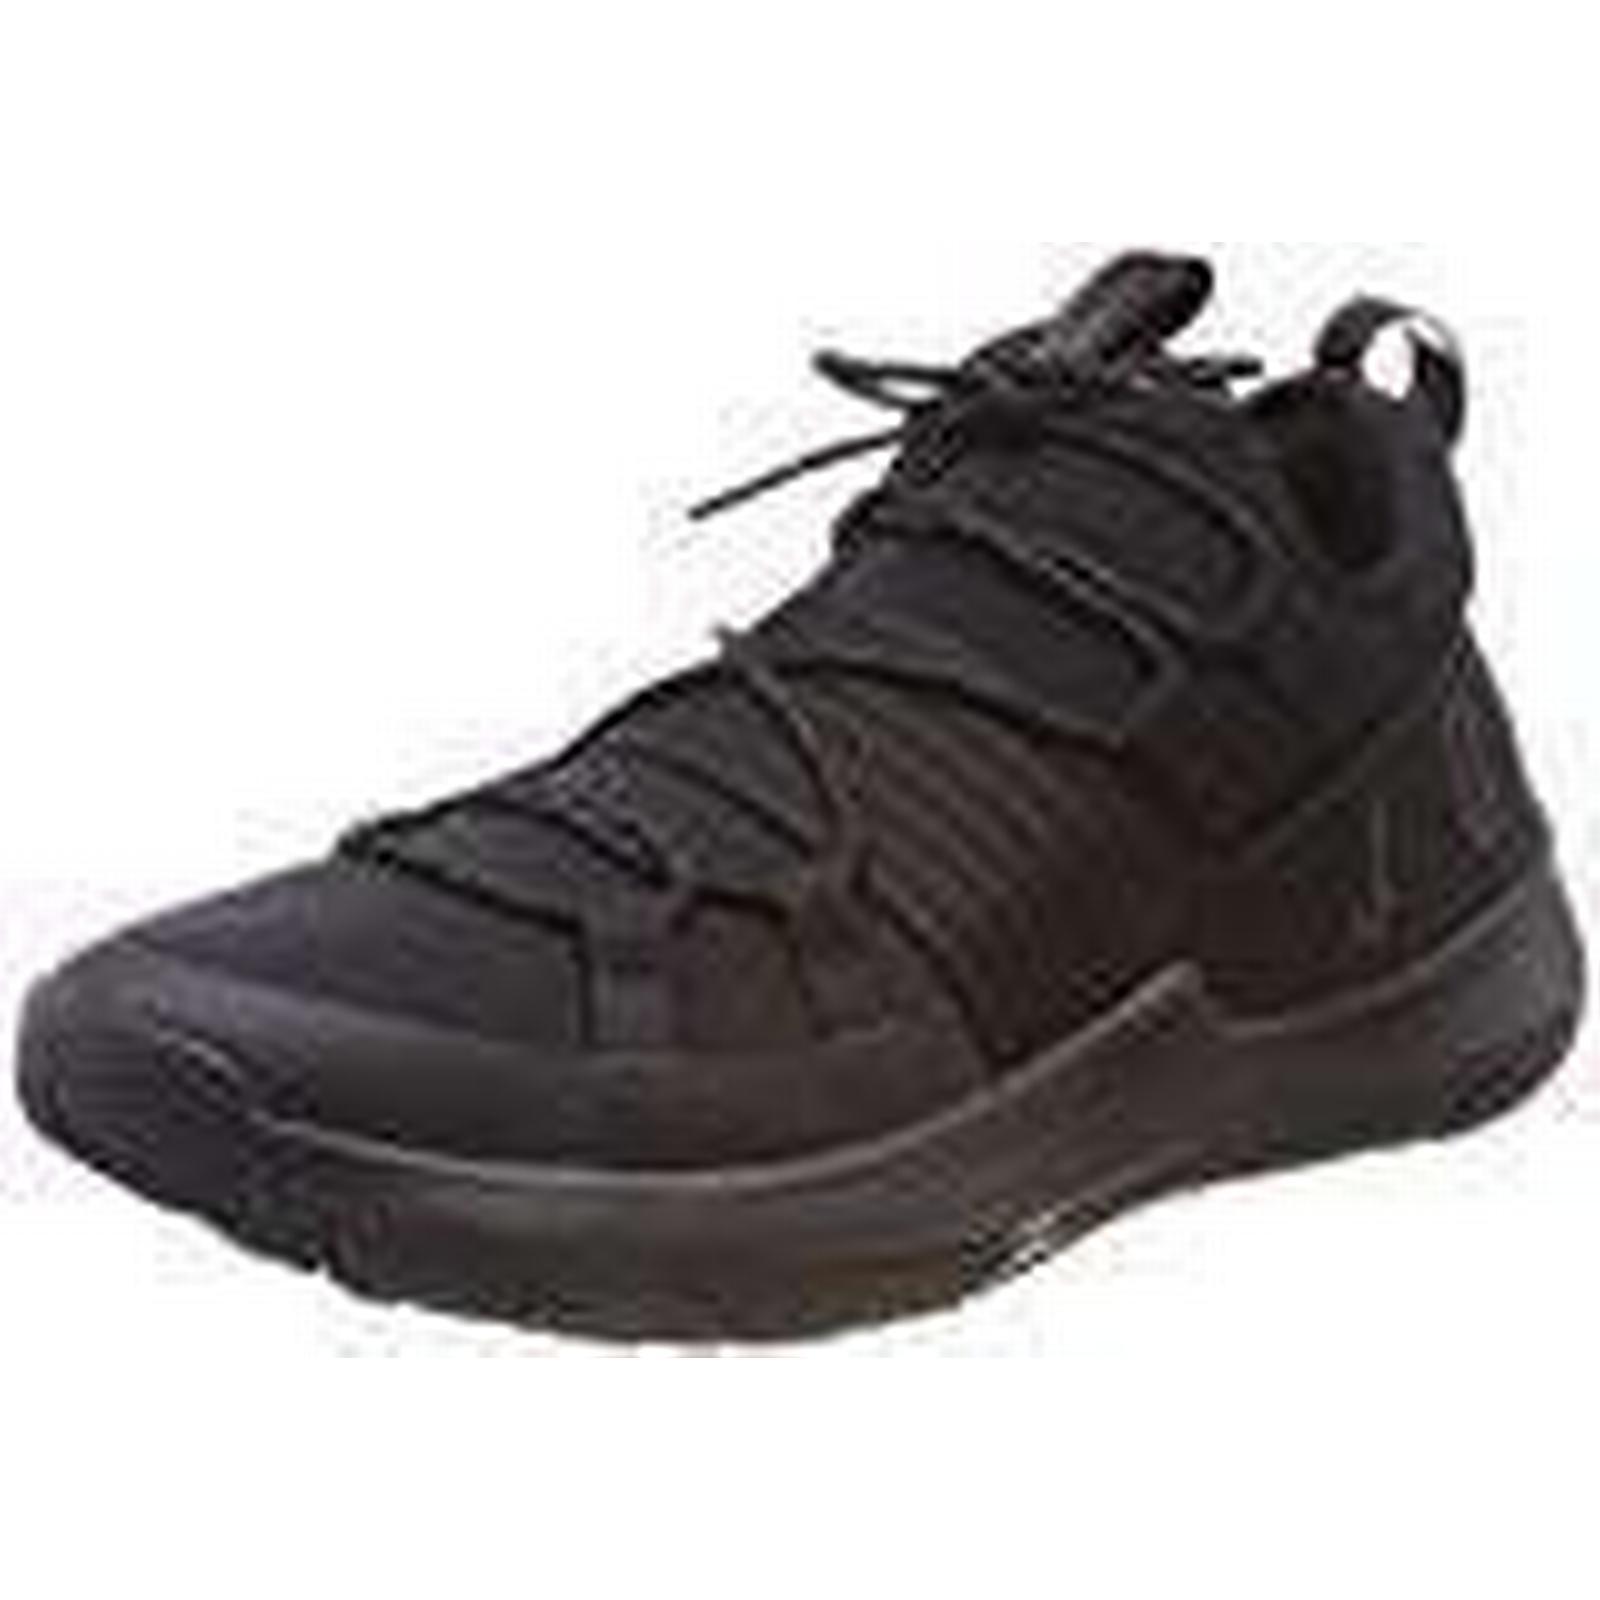 NIKE Basketball Men's Jordan Trainer Pro Basketball NIKE Shoes, (Black/Anthracite 002), 10 UK b07567